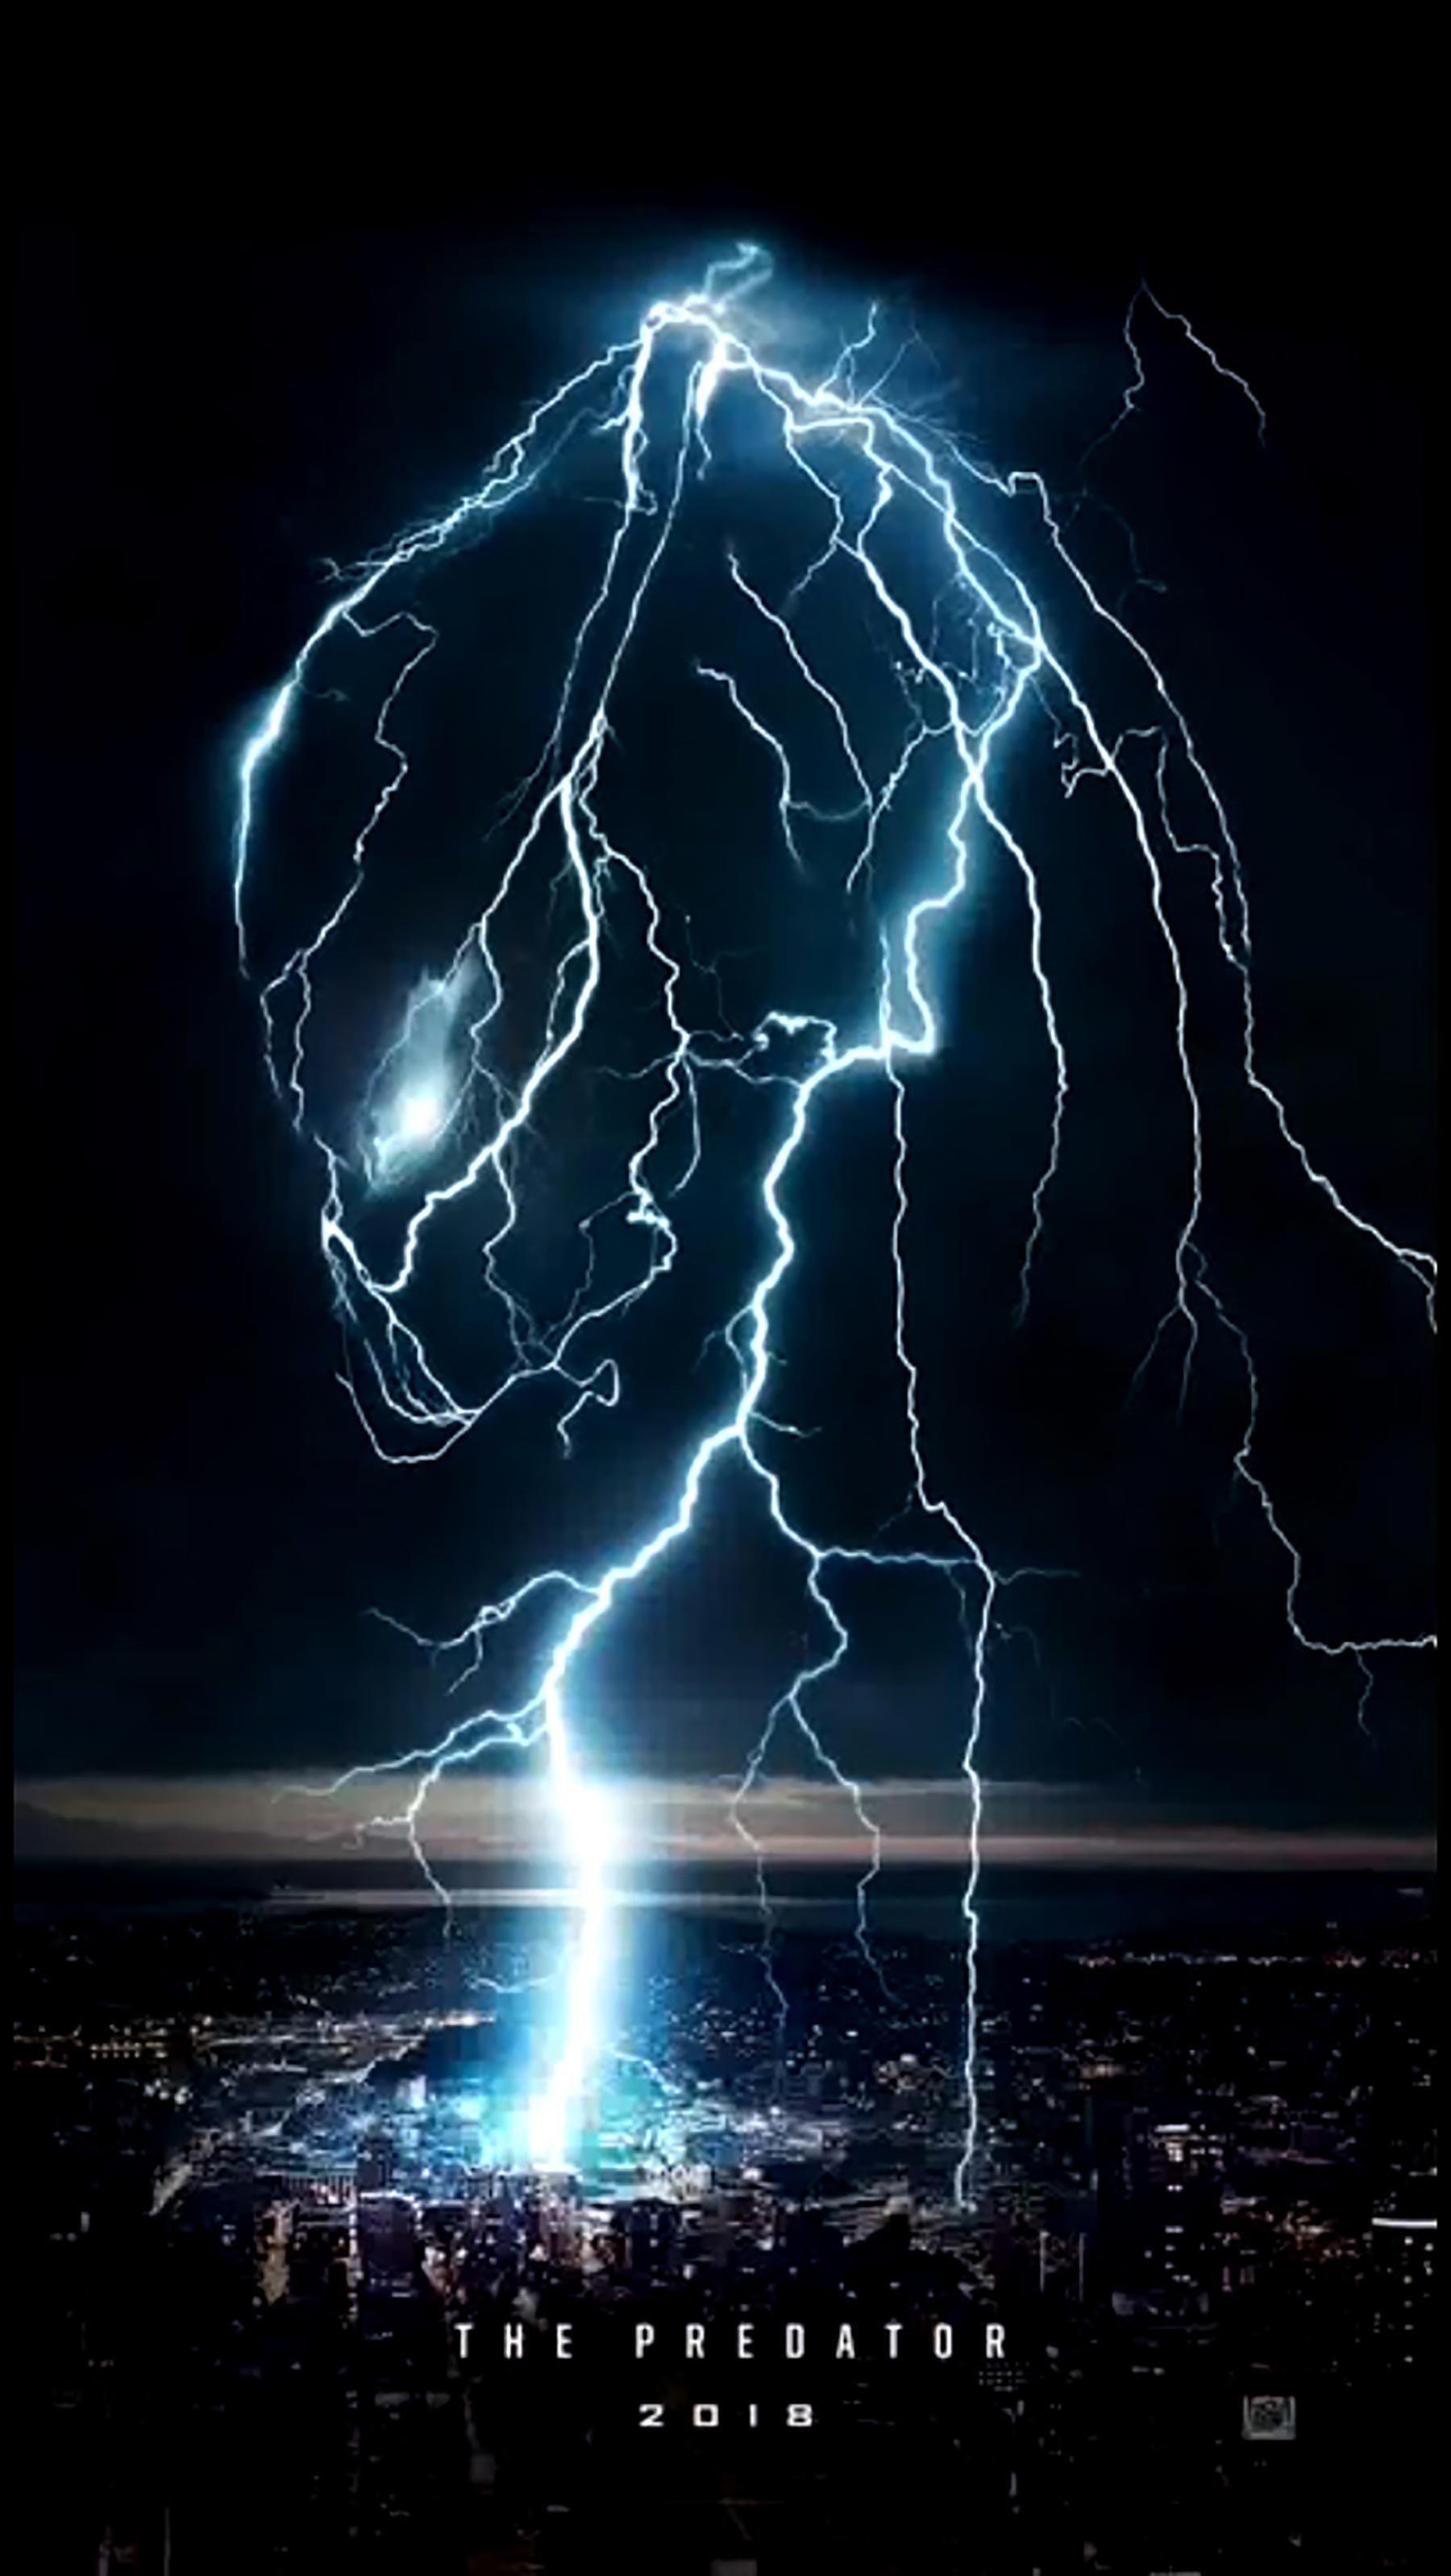 The Predator Plot Poster